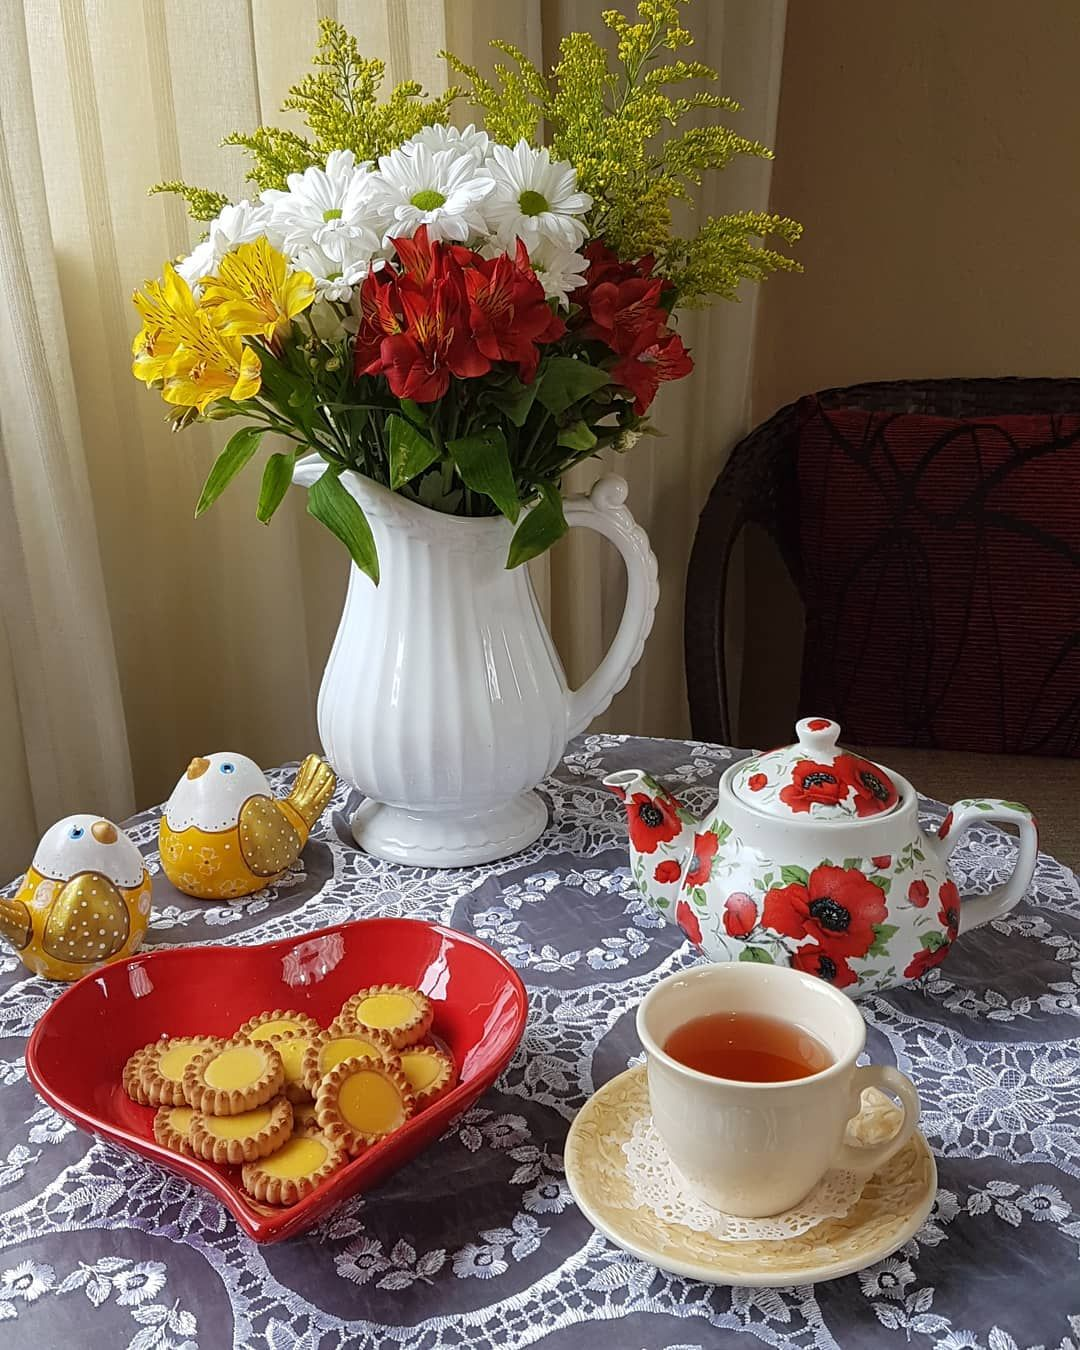 clicks de ceai de ceai